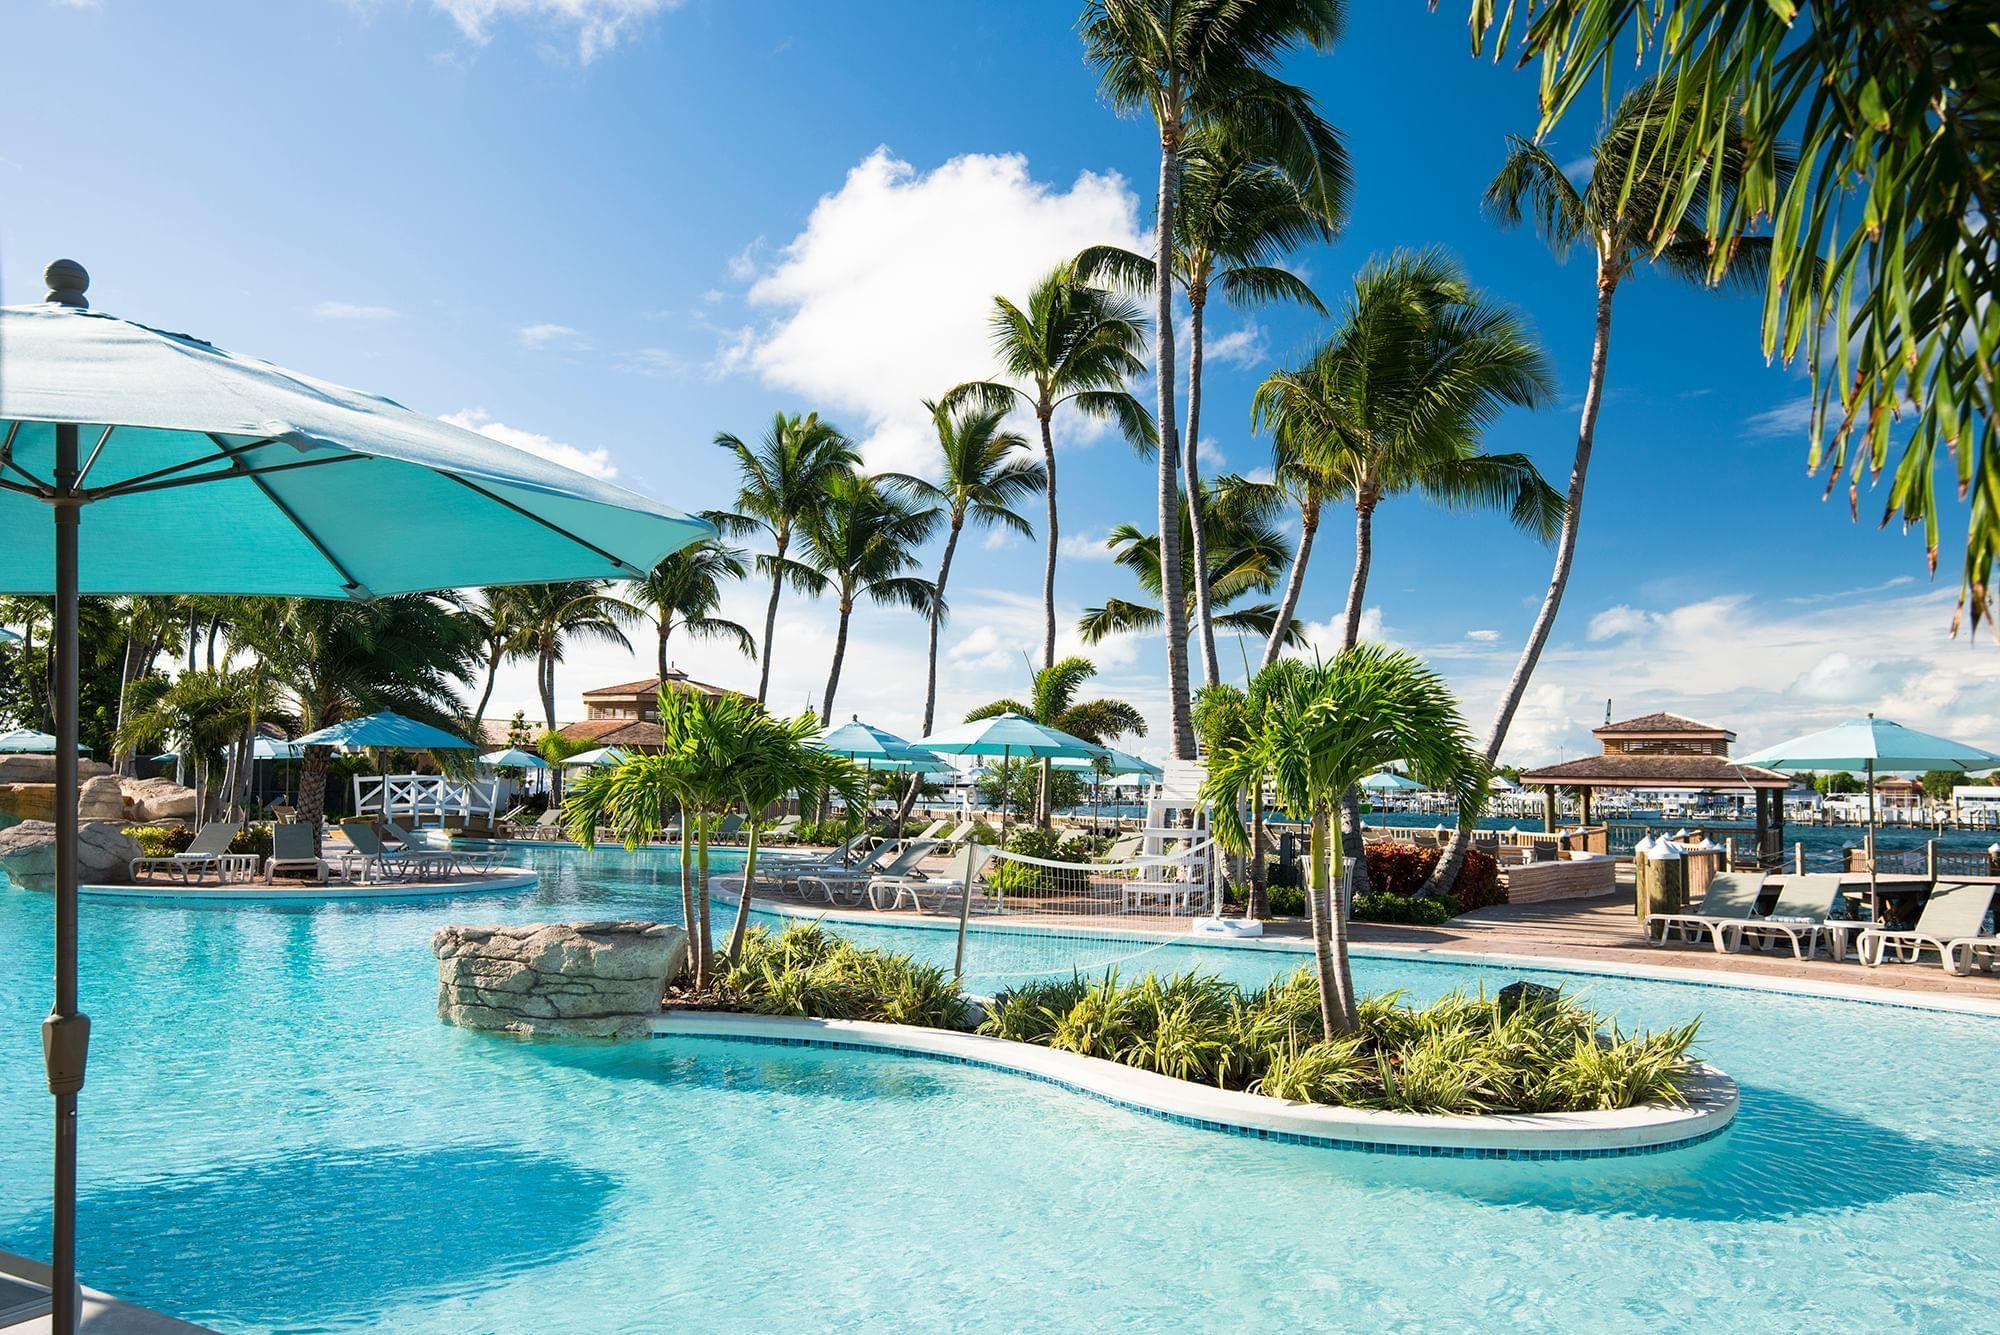 Warwick Paradise Island Bahamas Pool and Palms